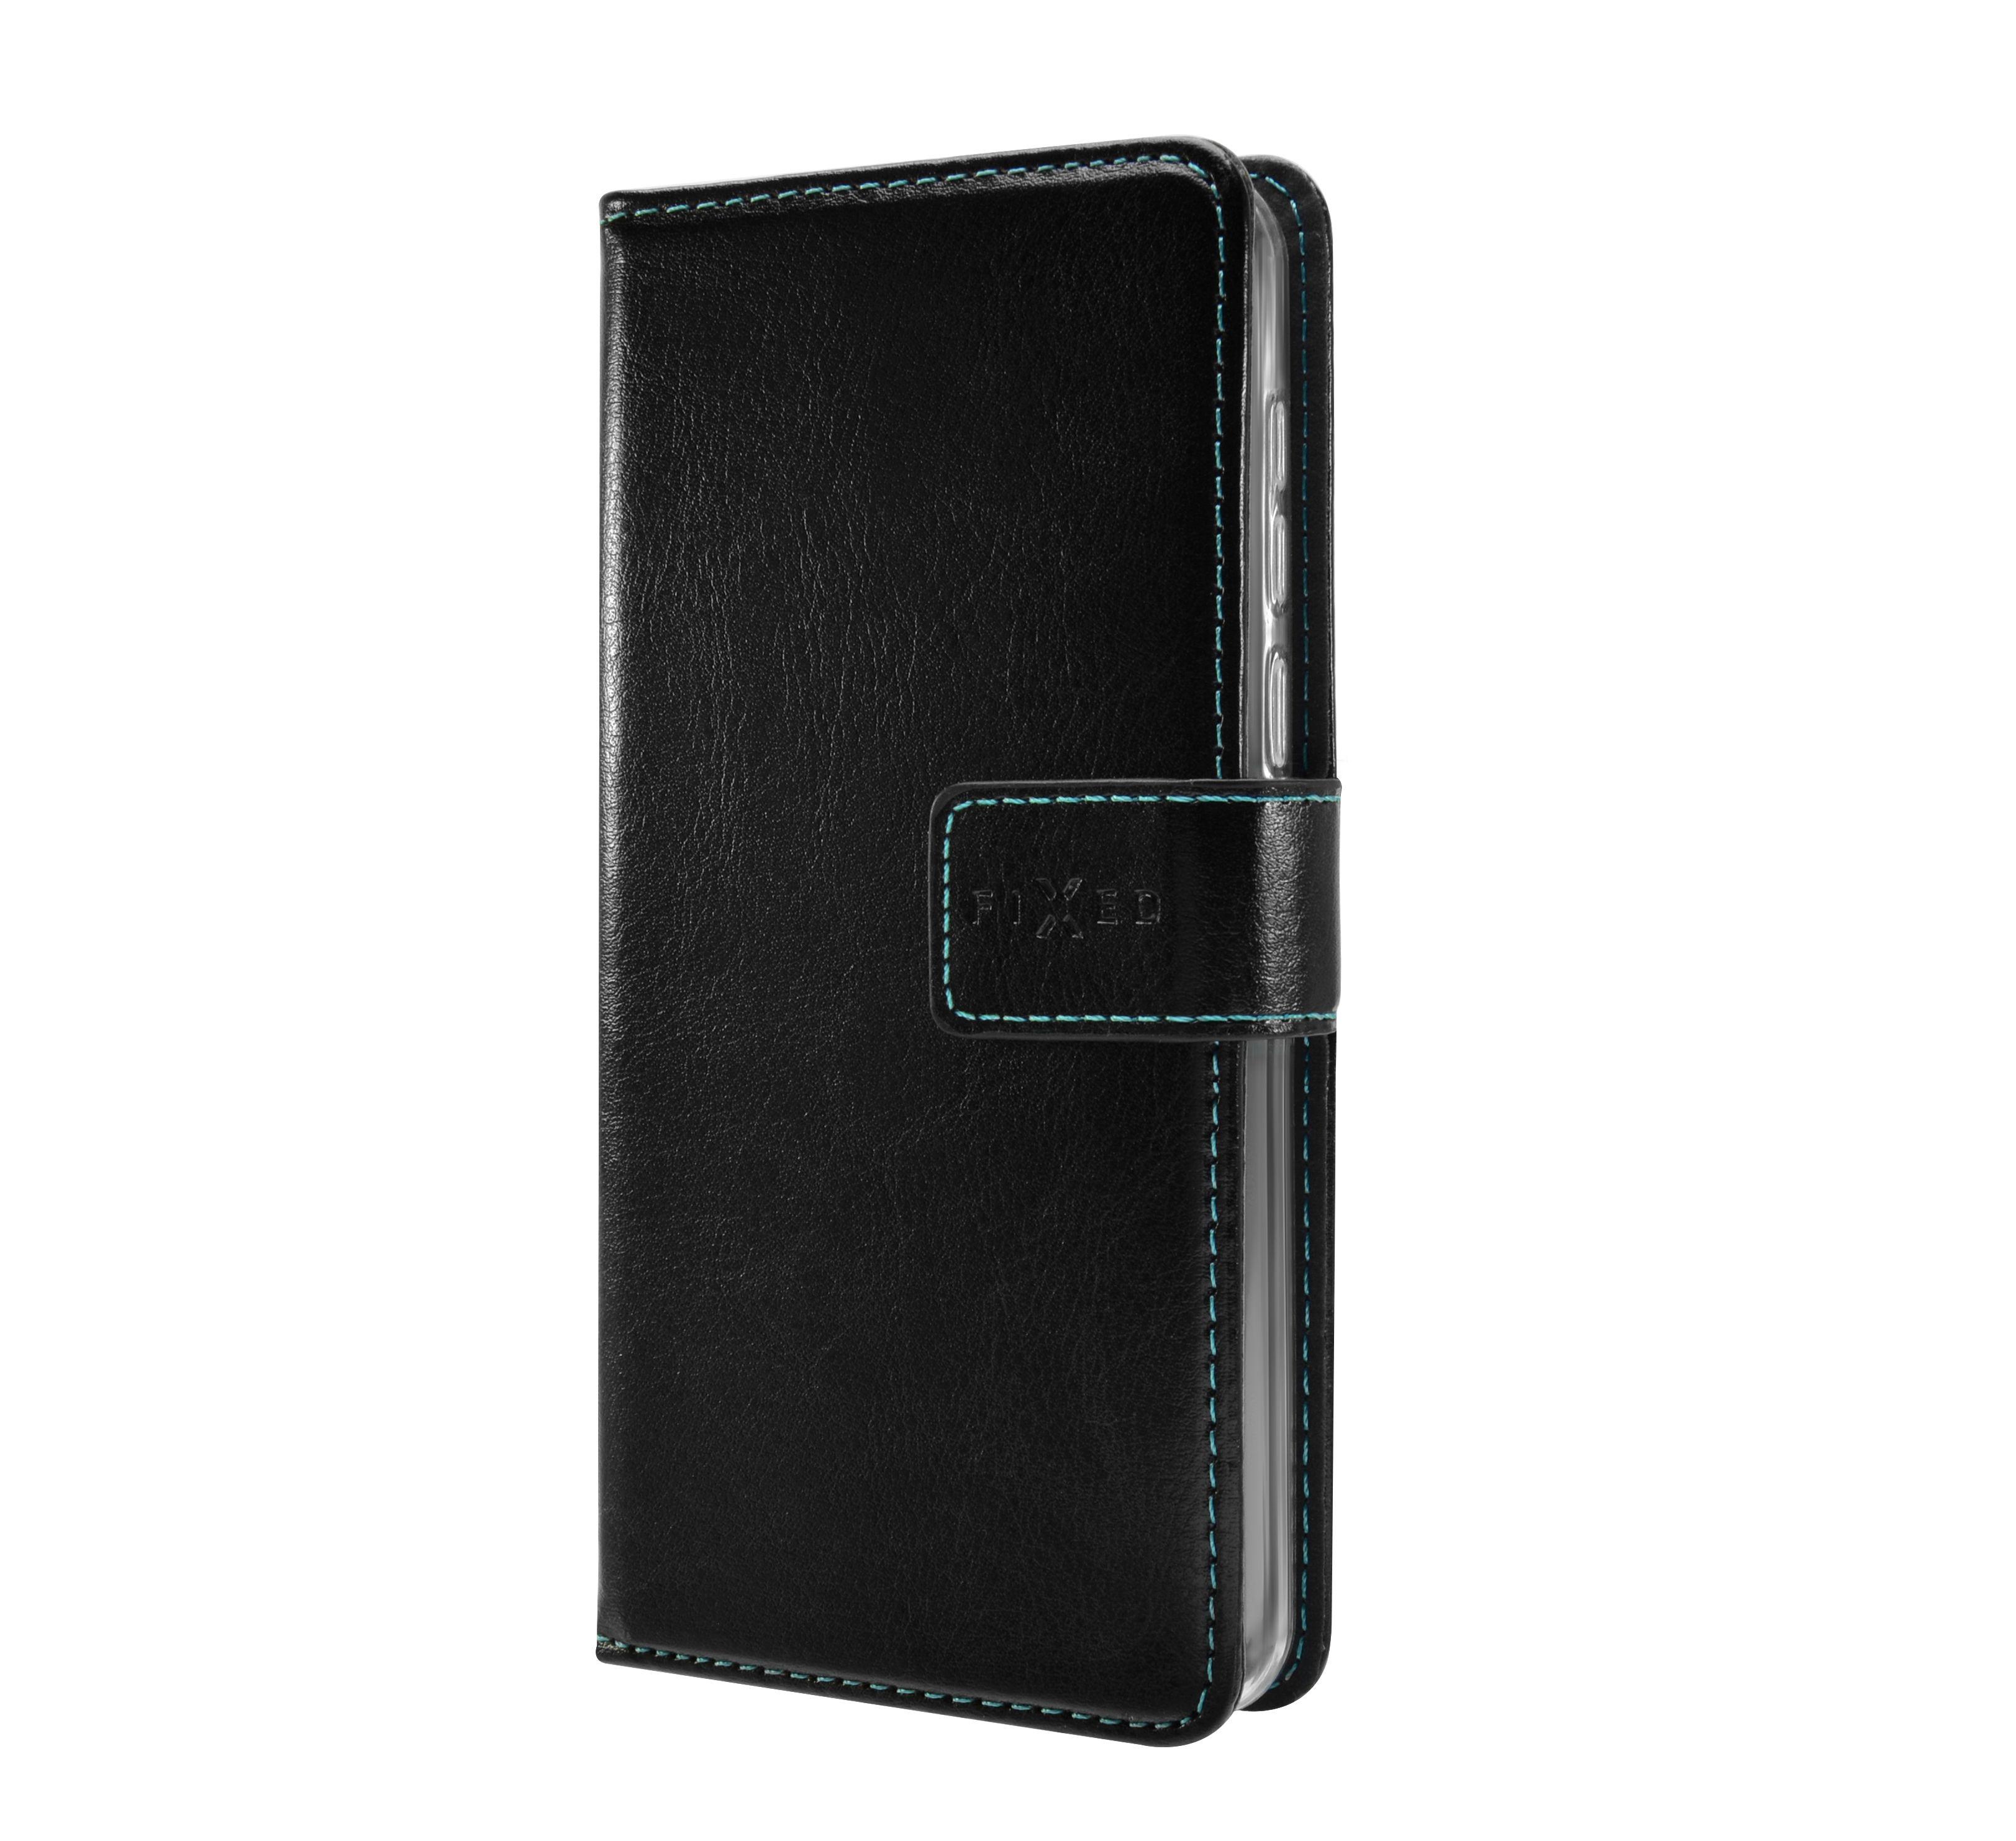 Pouzdro typu kniha FIXED Opus pro Xiaomi Redmi 6A, černé